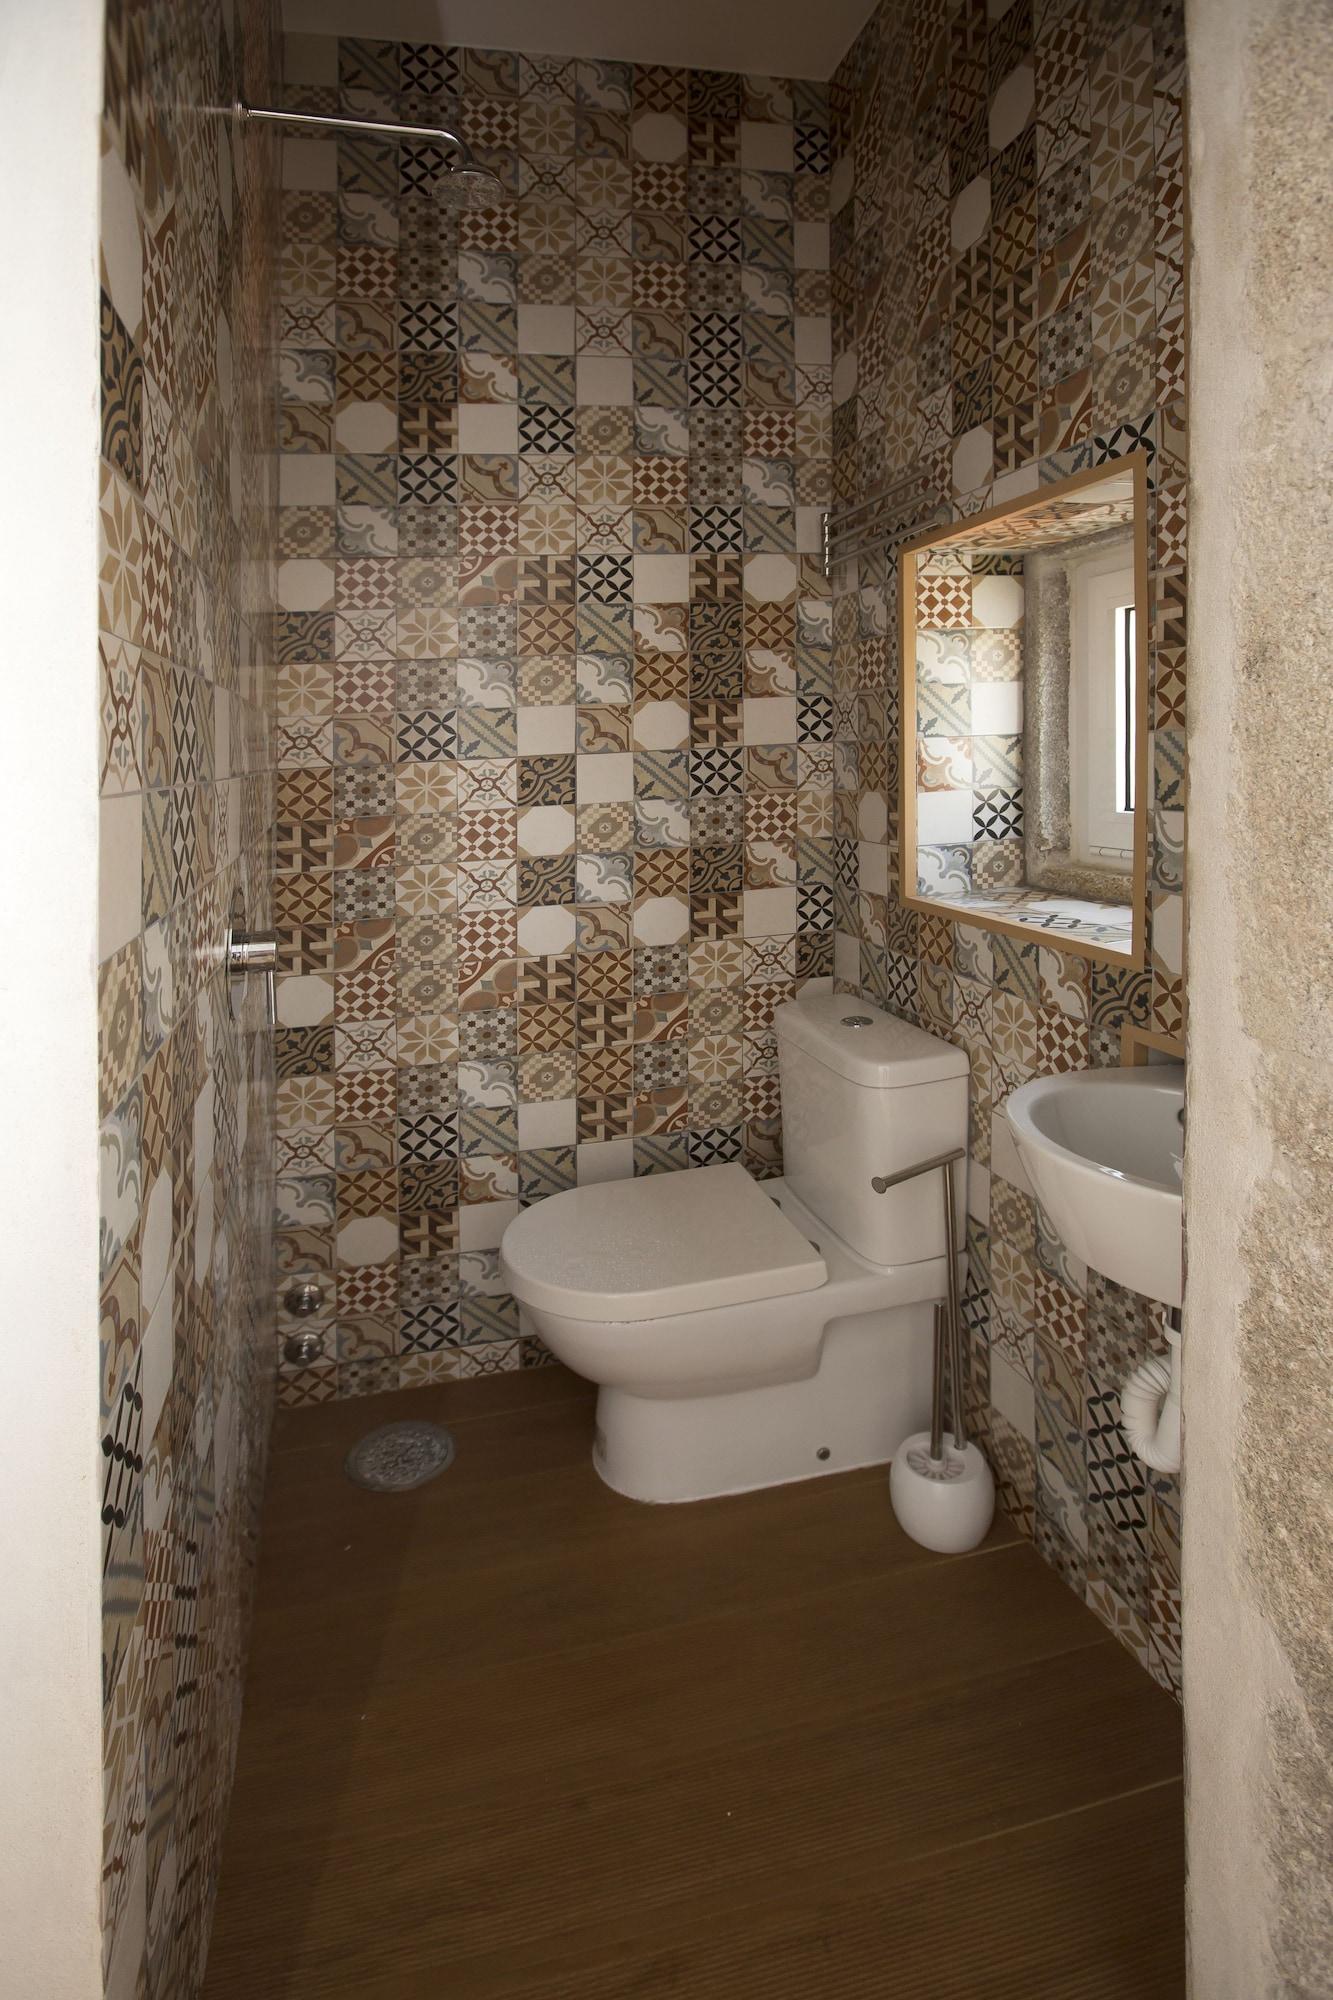 Comendador 1895 Apartments 7, Porto